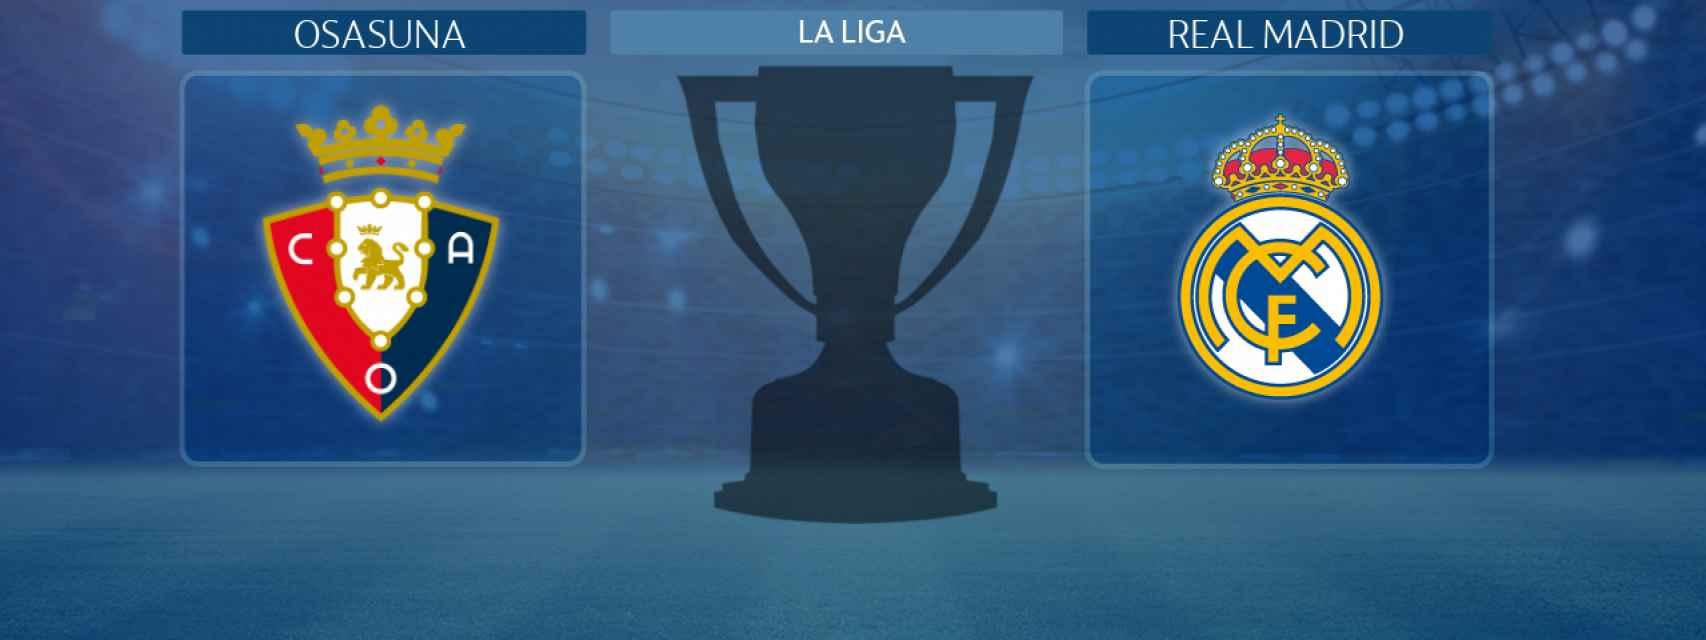 Osasuna - Real Madrid, partido de La Liga